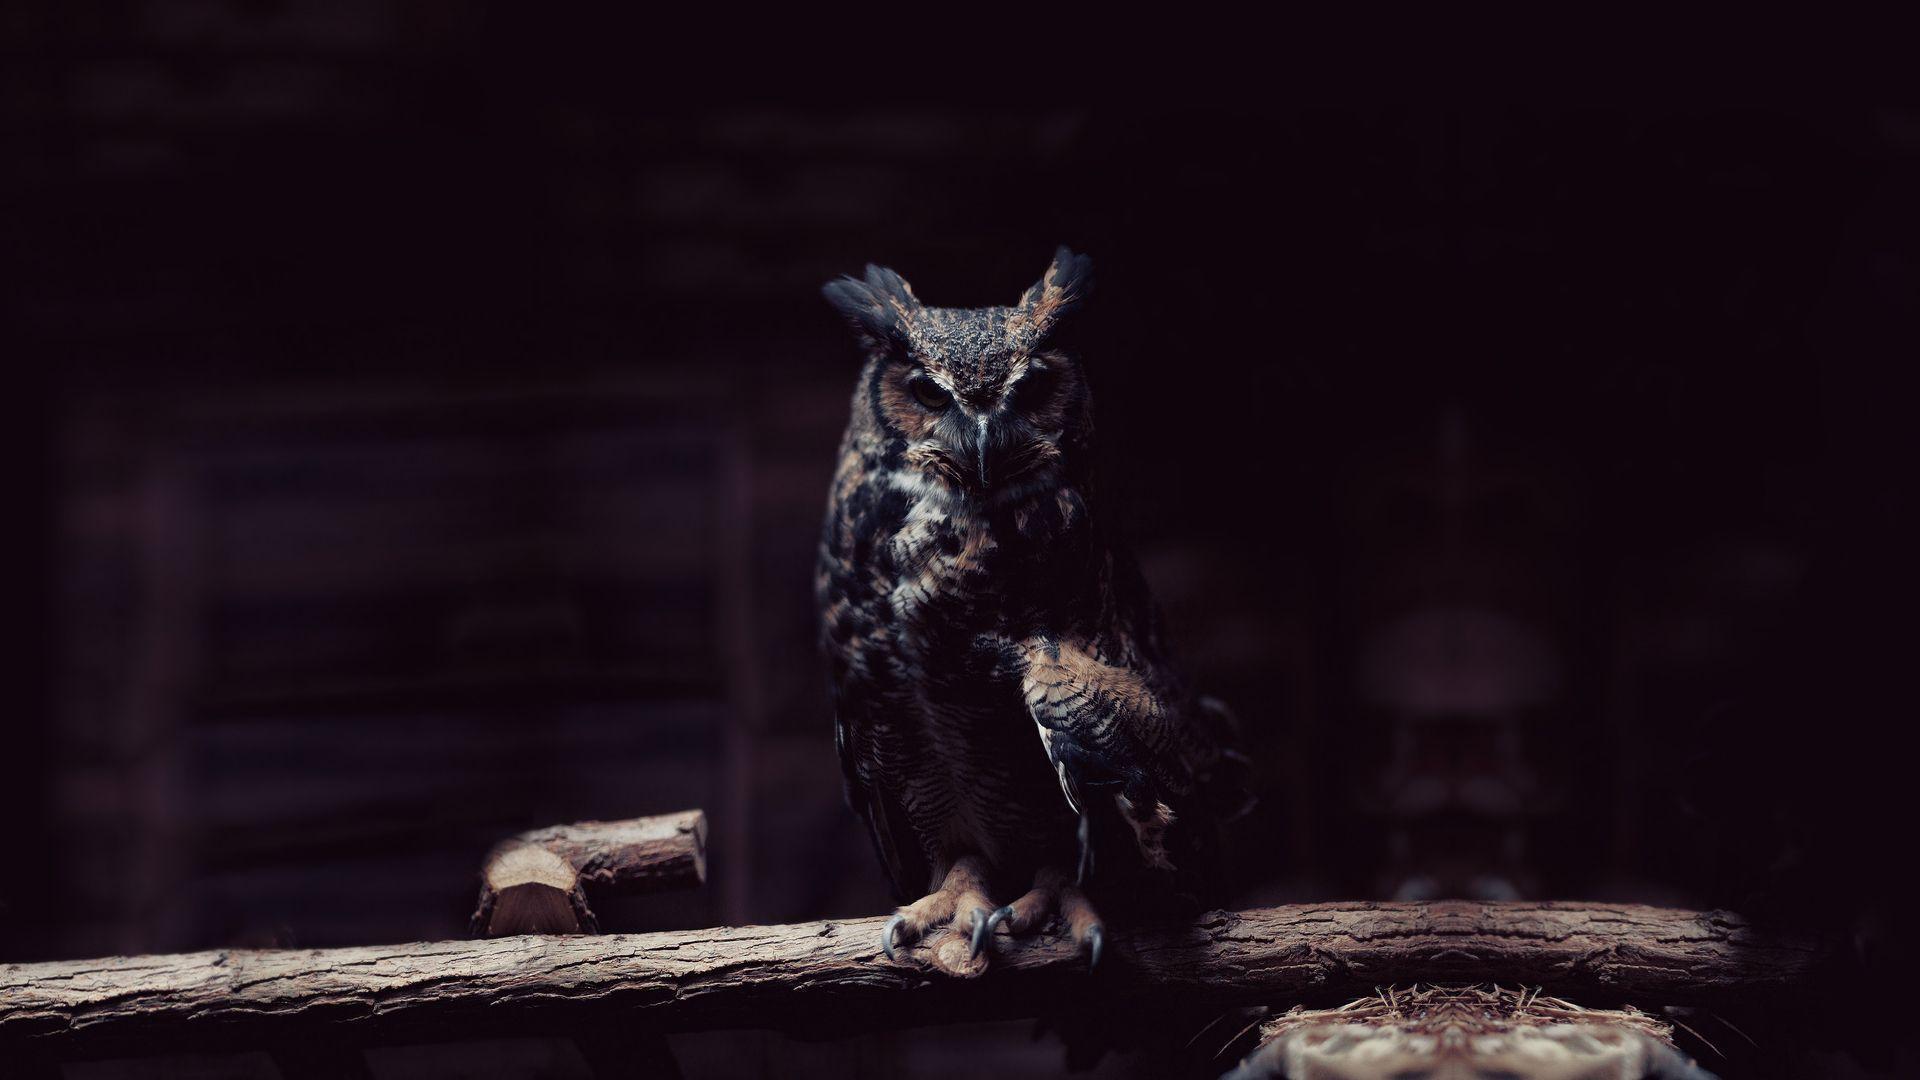 owl wallpaper   owl wallpaper – Part 2